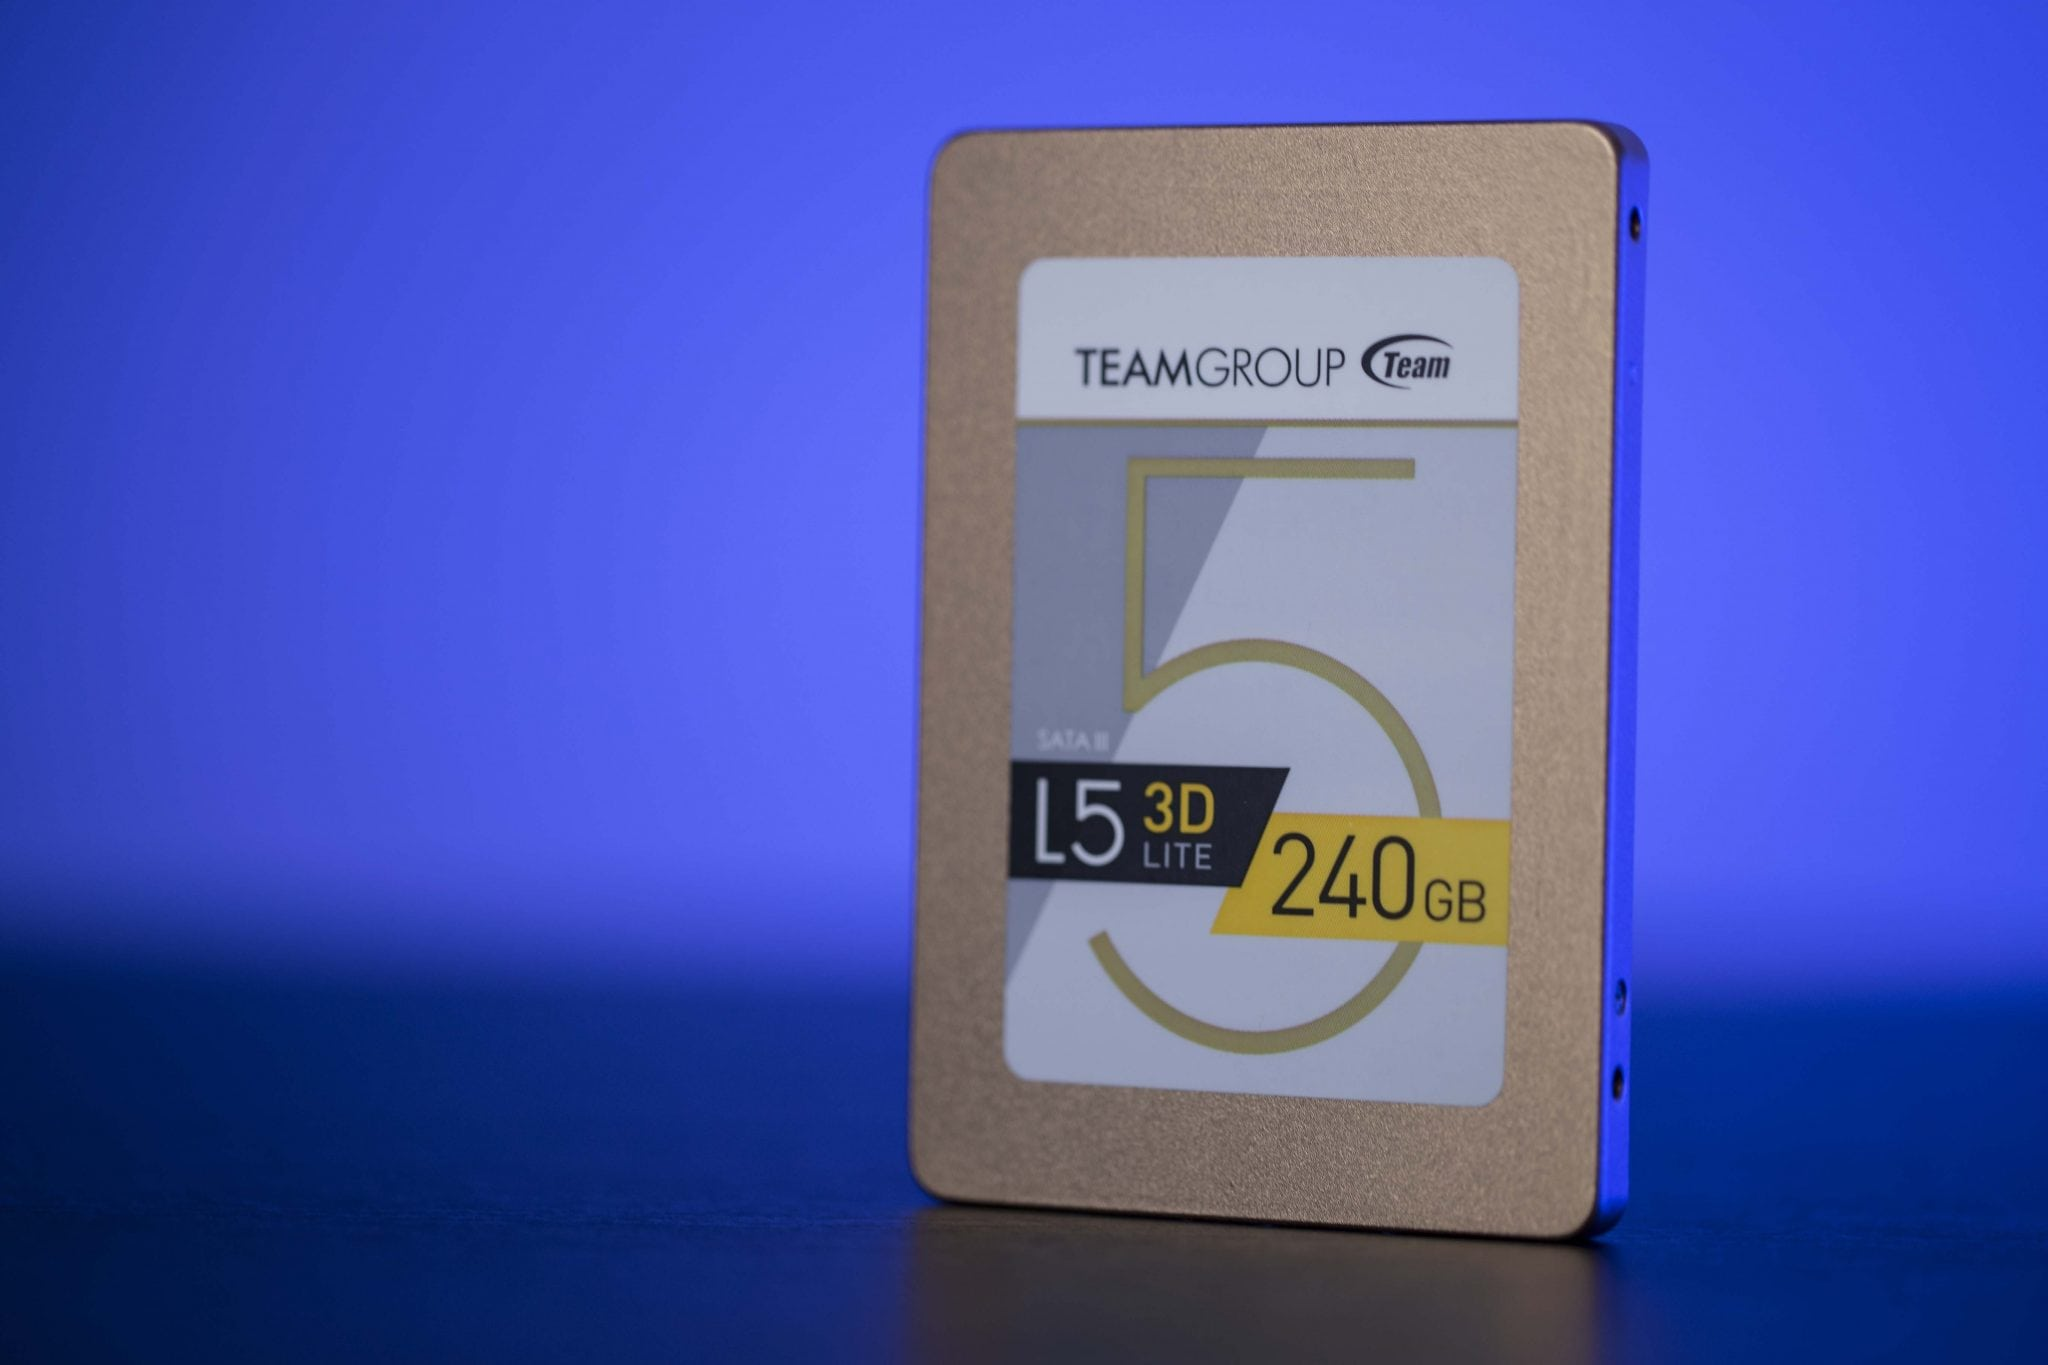 Team L5 LITE 3D 240 GB